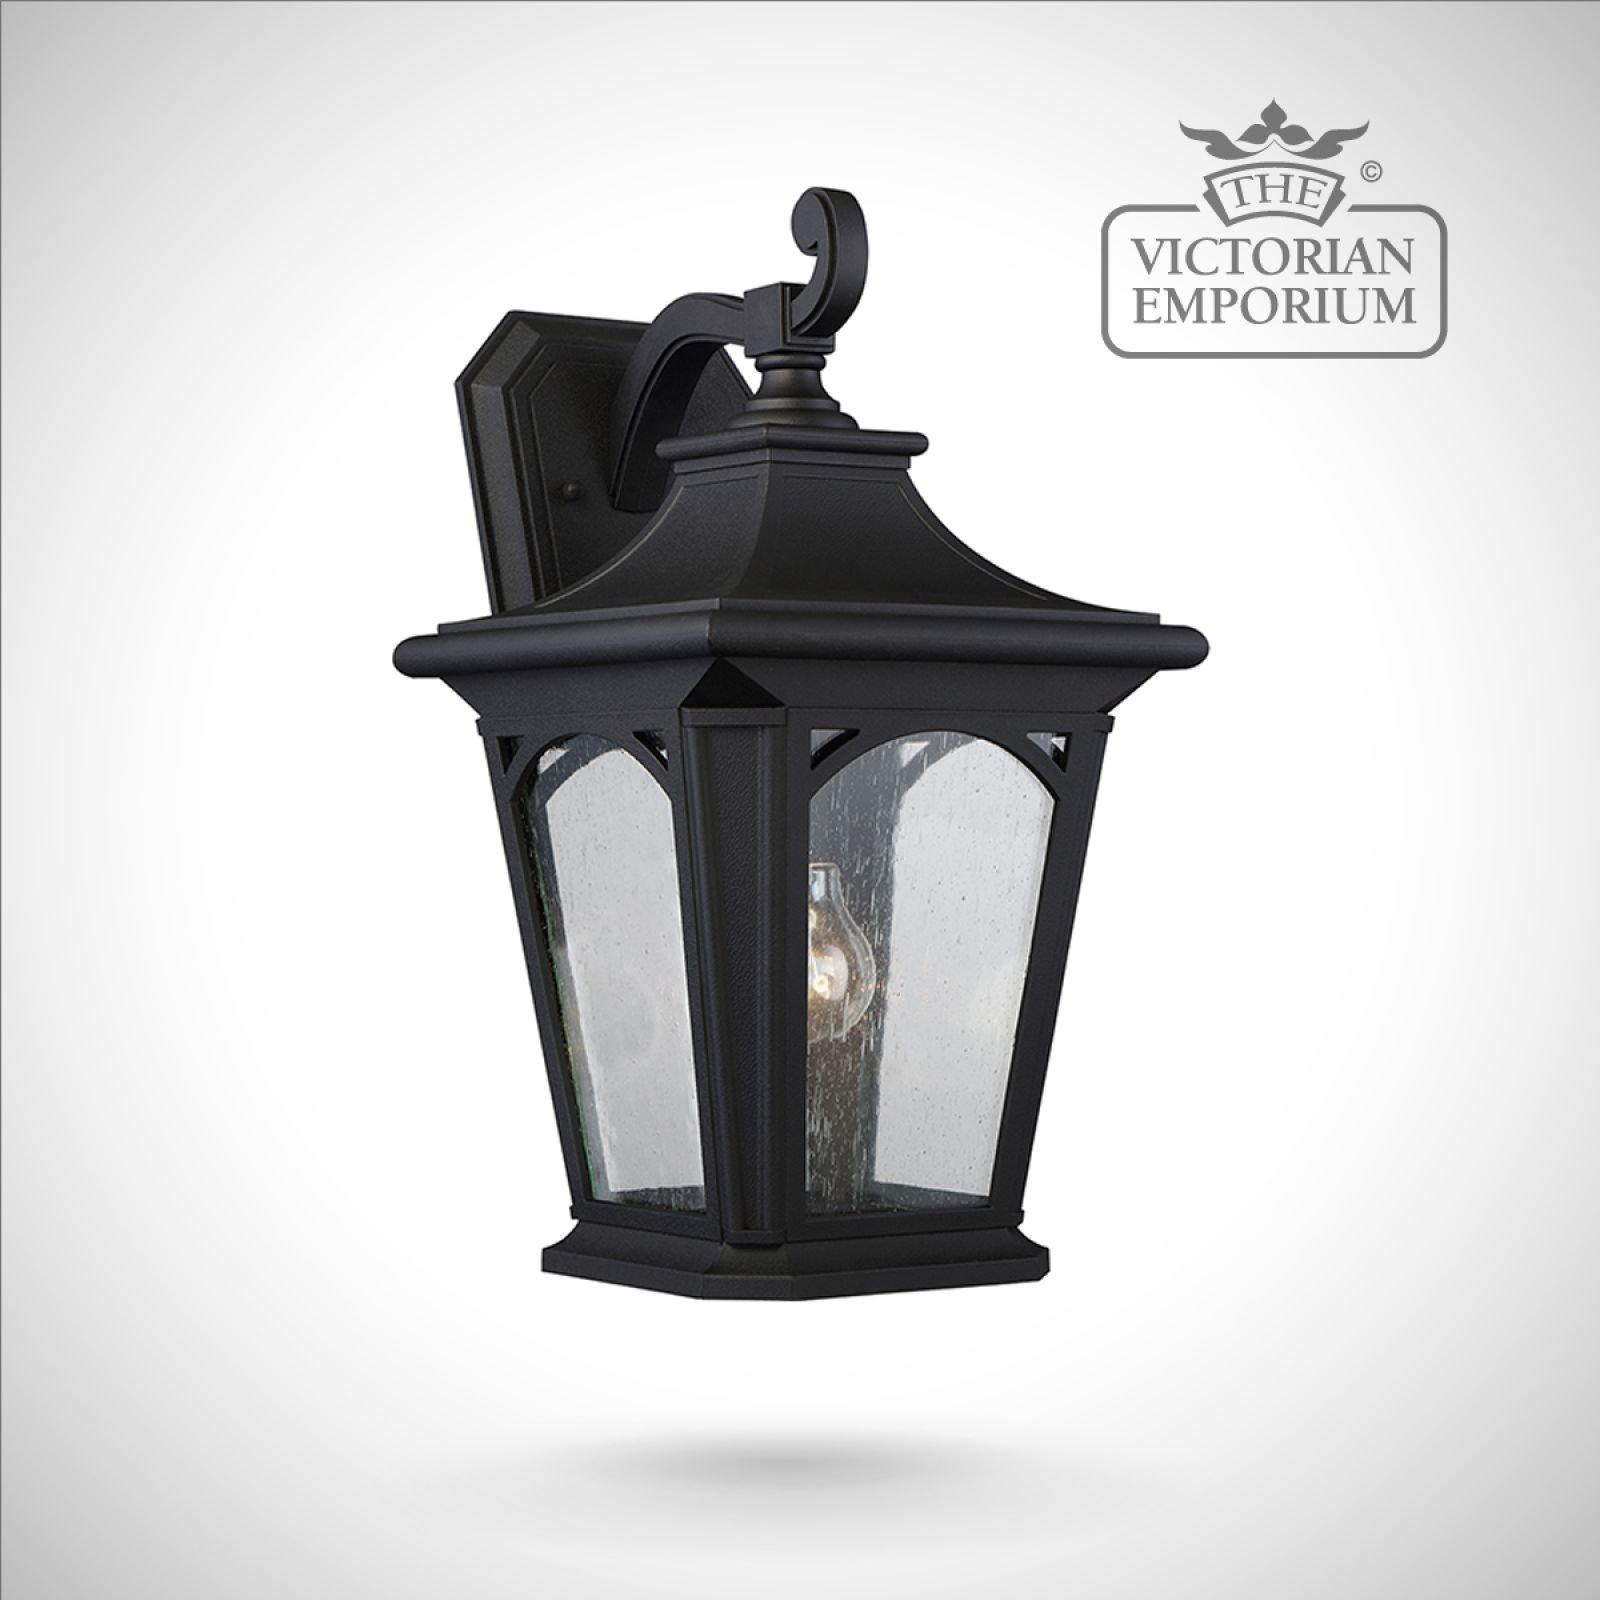 Bedfords Medium Pedestal Lantern In Black: Bedfords Large Wall Lantern In Black